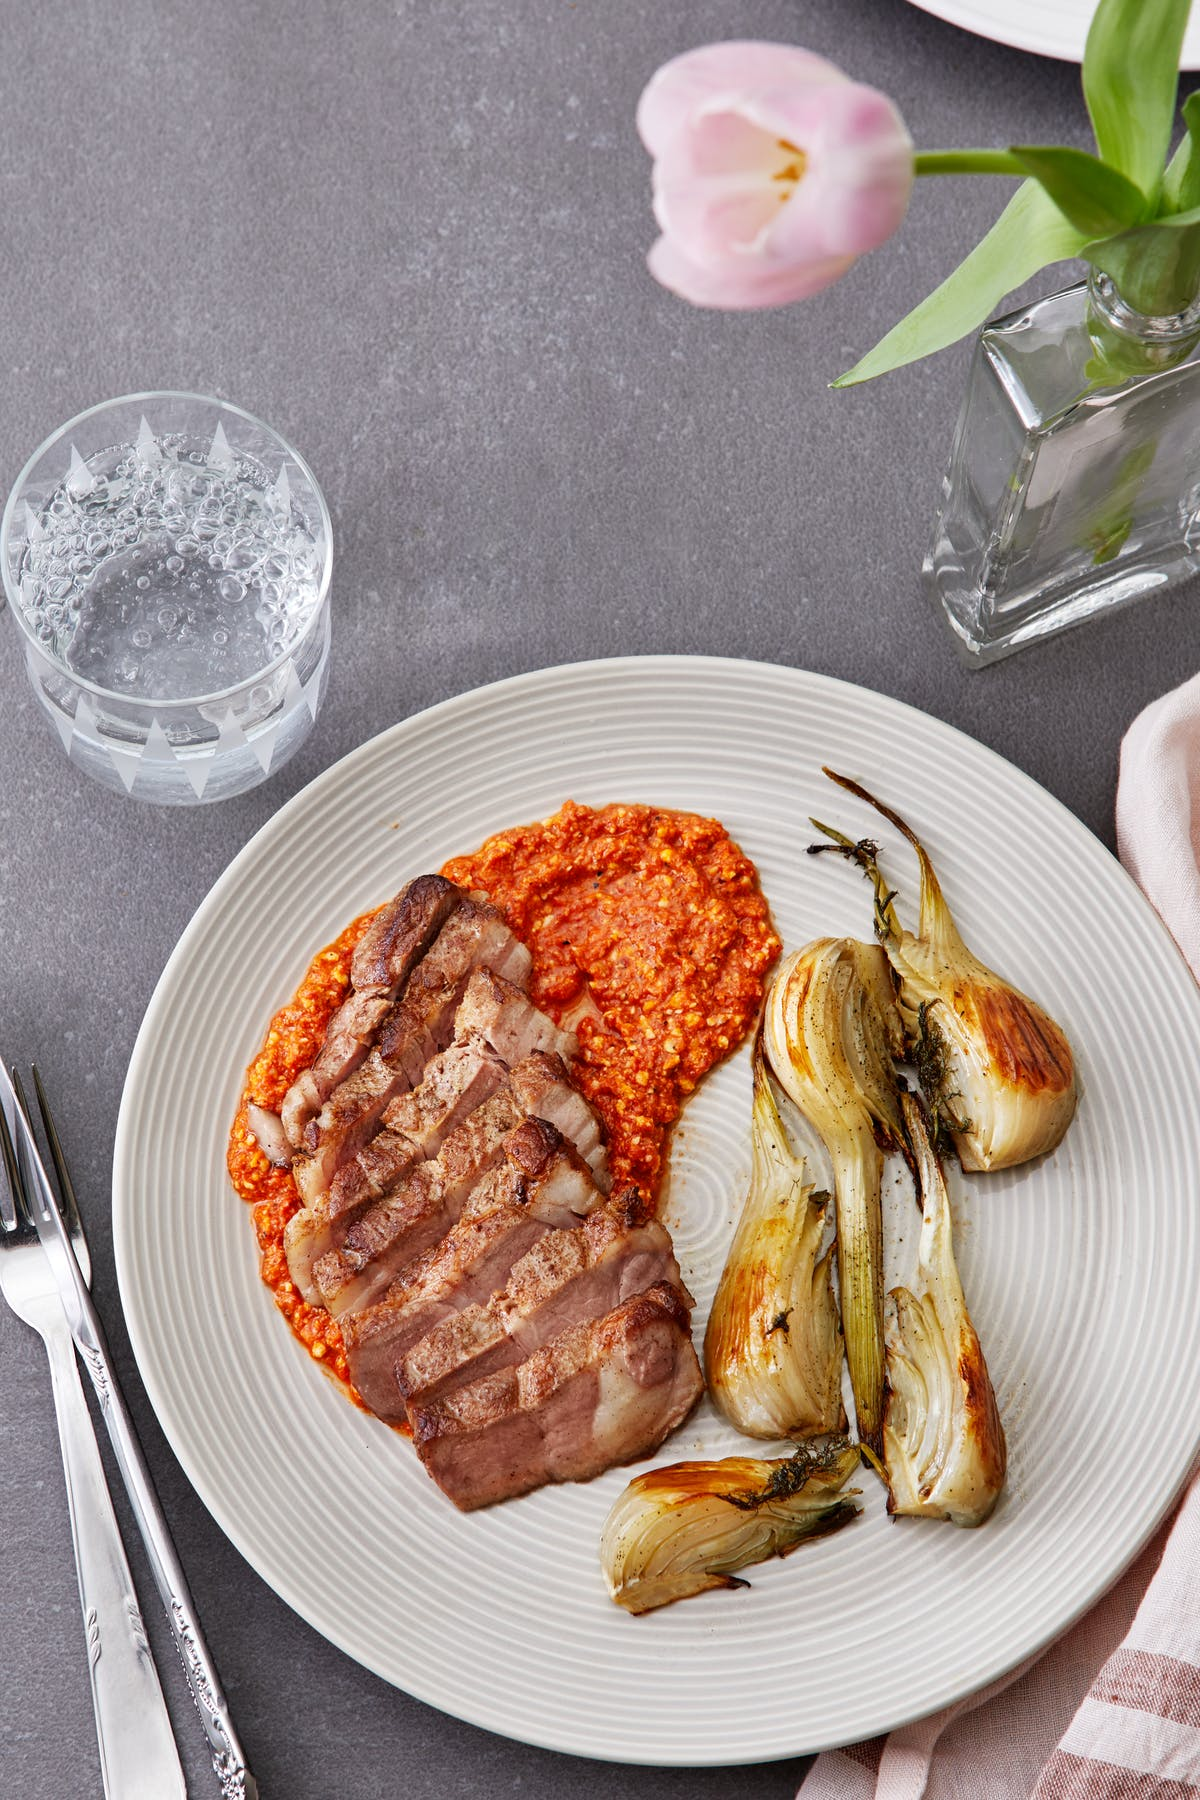 Paletas de cerdo con hinojo asado y salsa romesco